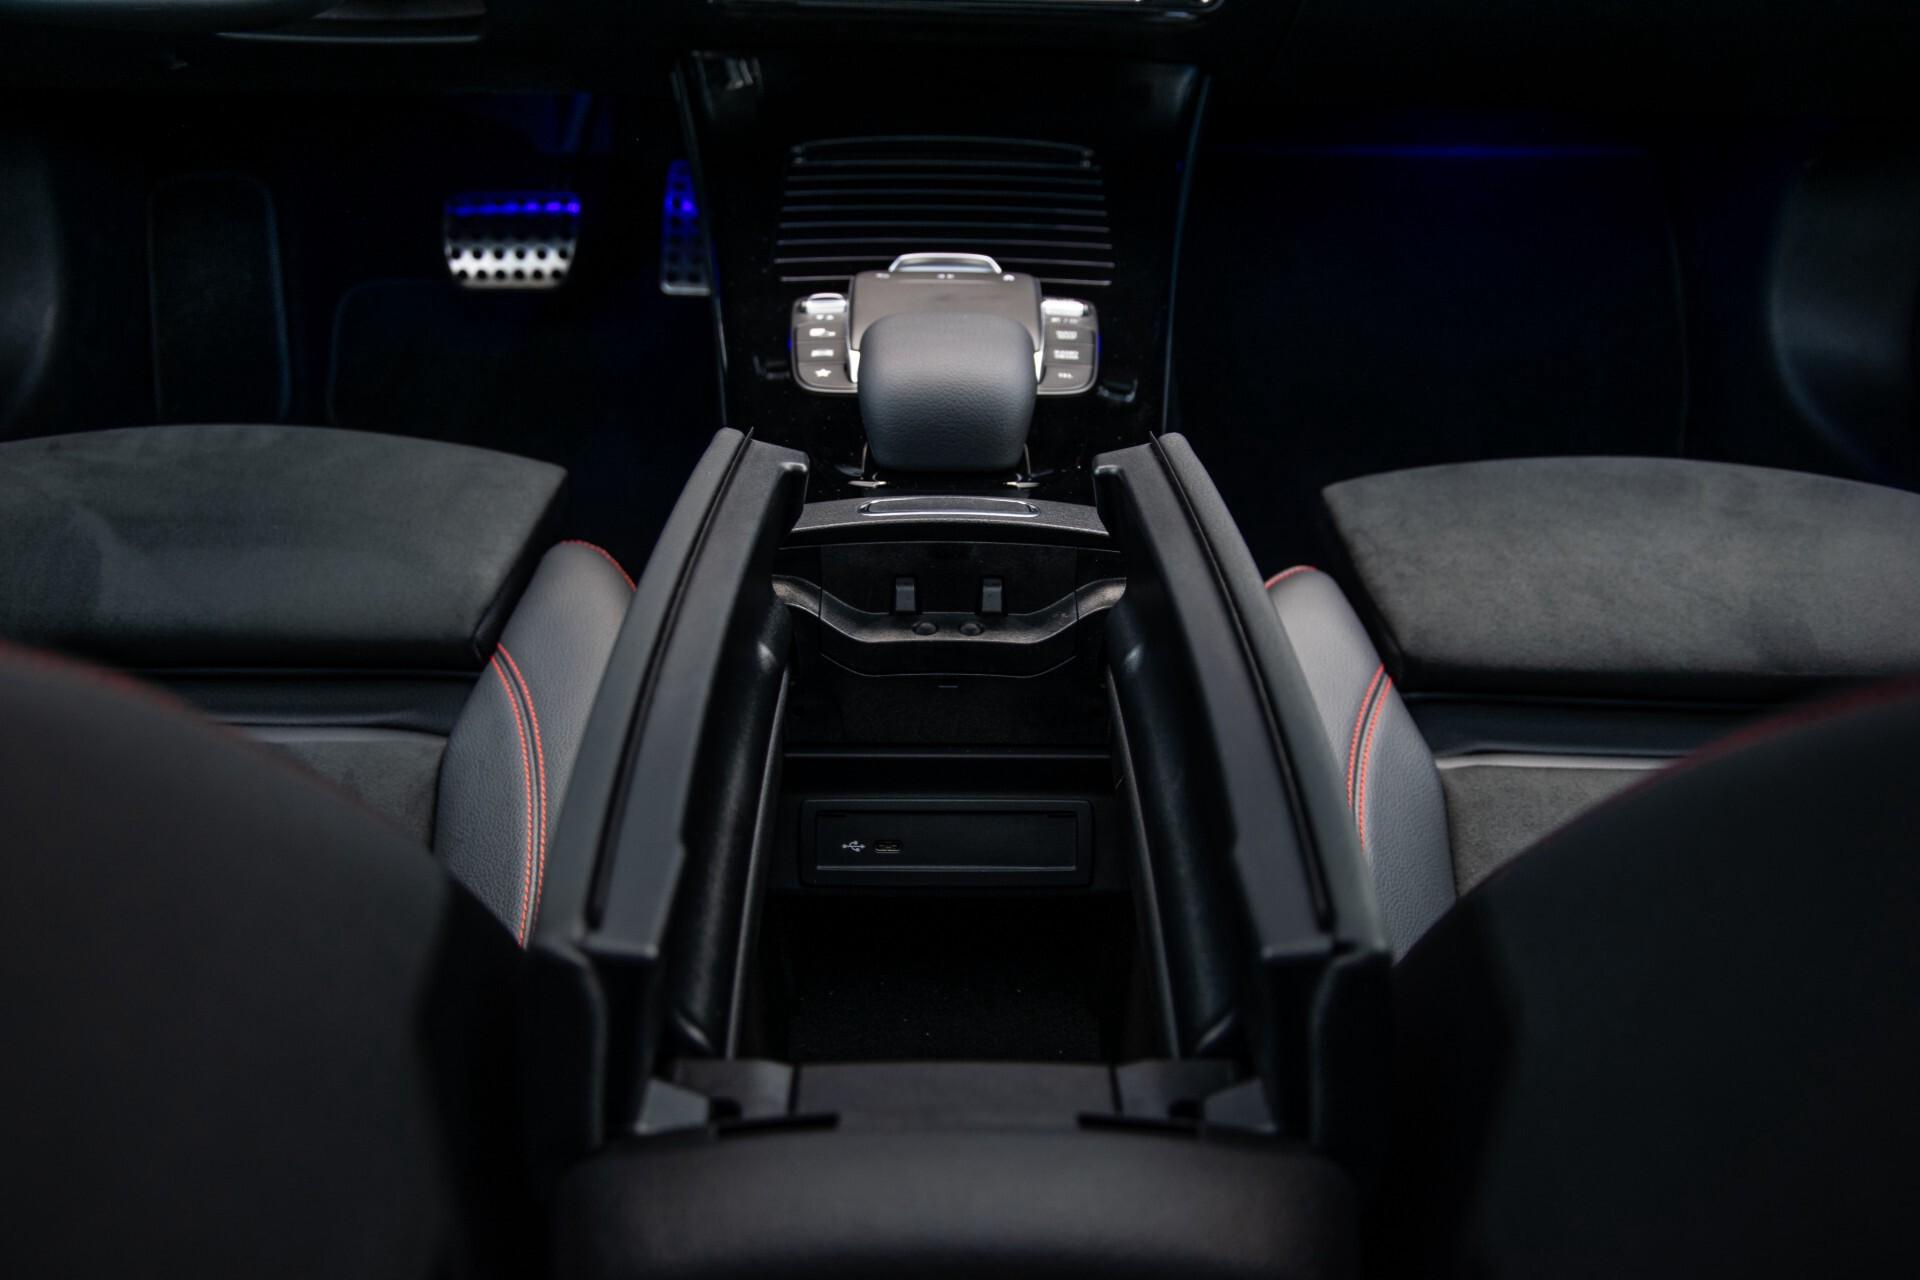 Mercedes-Benz A-Klasse 250 4-M AMG Panorama/Keyless-Entry/MBUX/HUD/Burmester/360/Multibeam LED Aut7 Foto 49